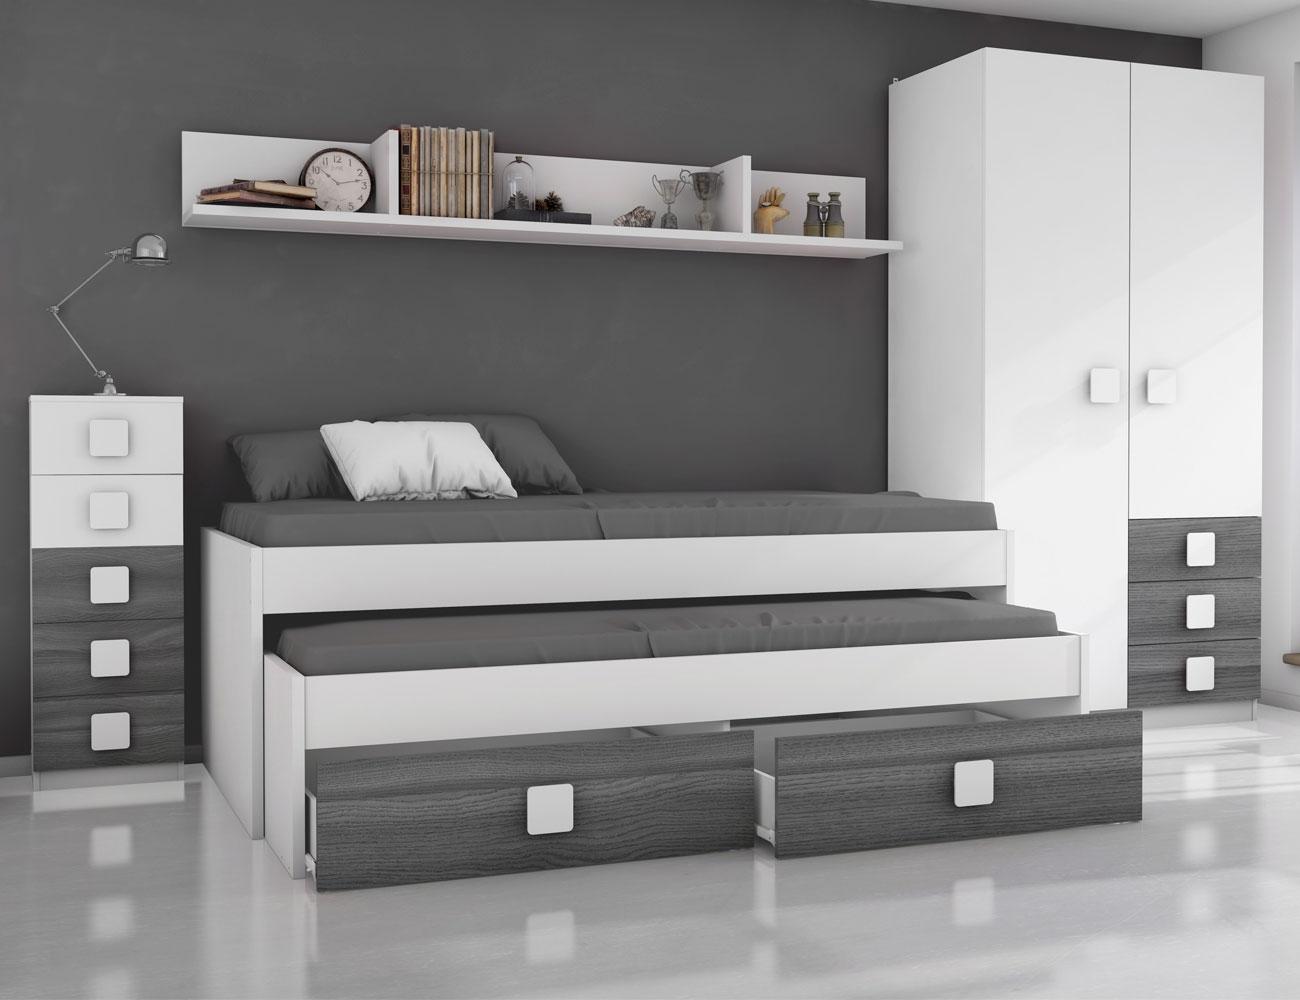 Dormitorio juvenil ceniza blanco1